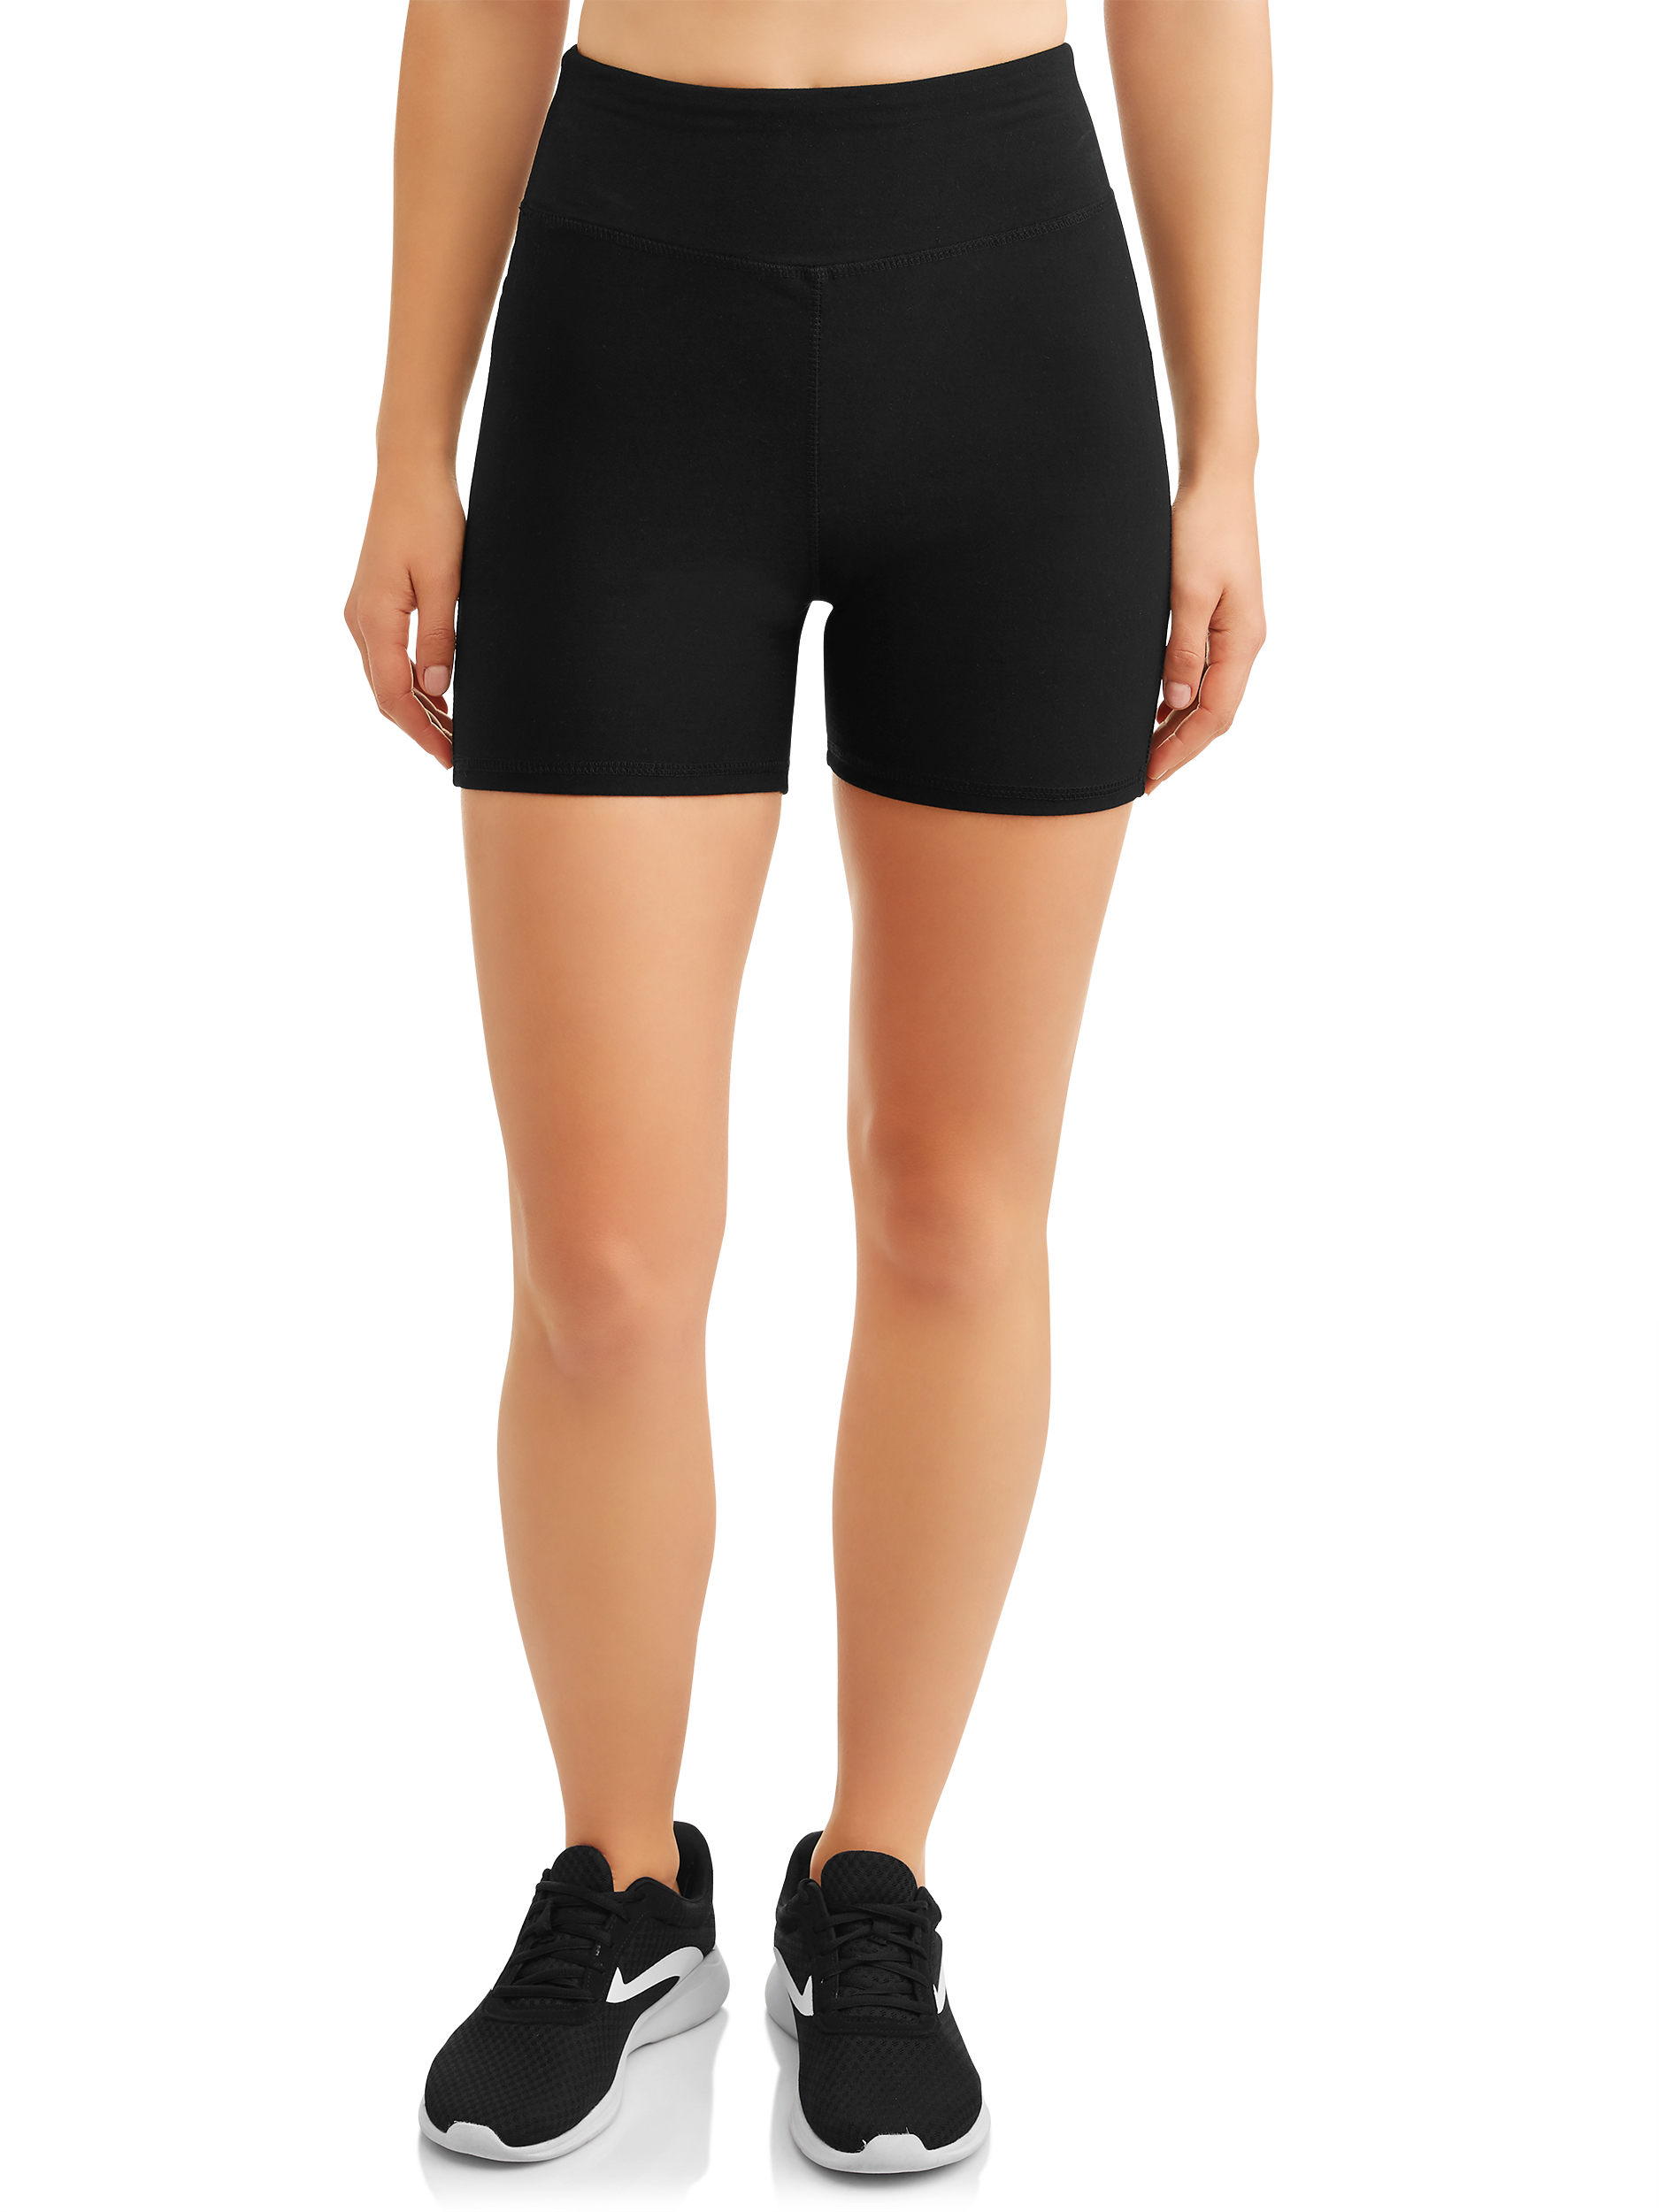 "Women's Active Biker shorts 5"" Inseam"